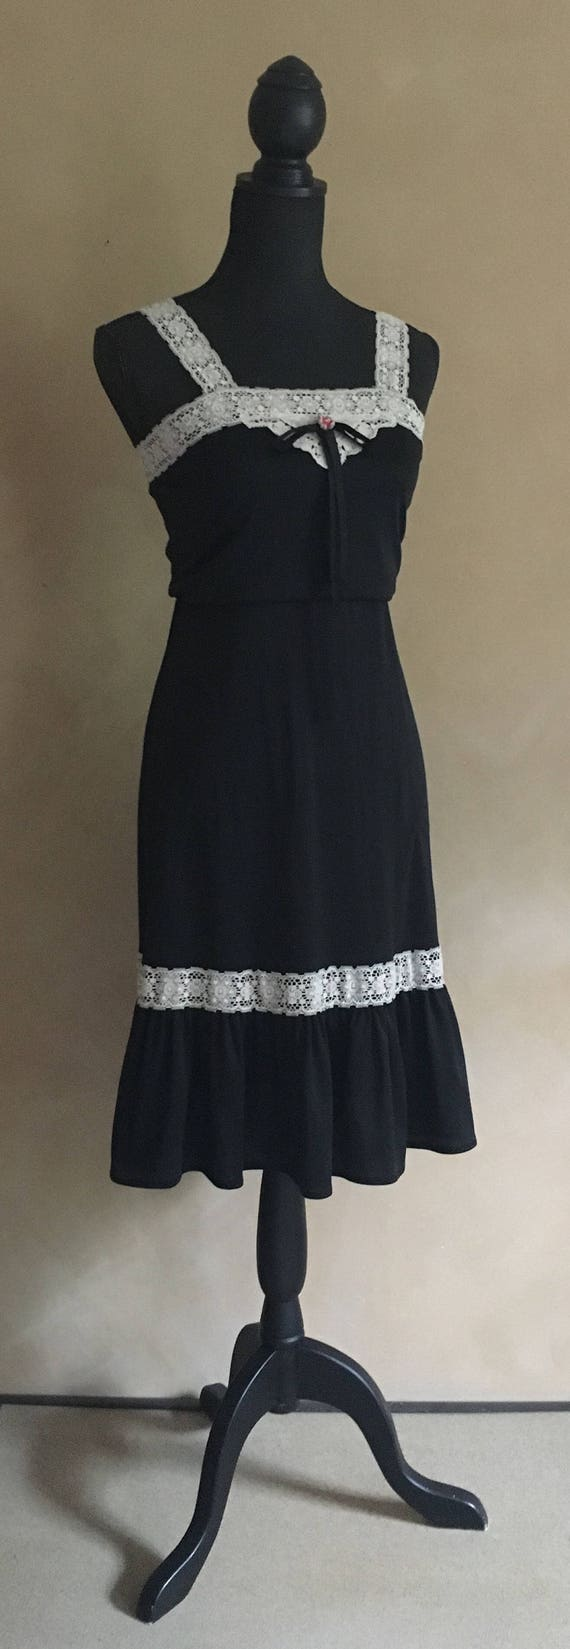 Dress Vintage 70's Black with Lace trim Petite xsmall